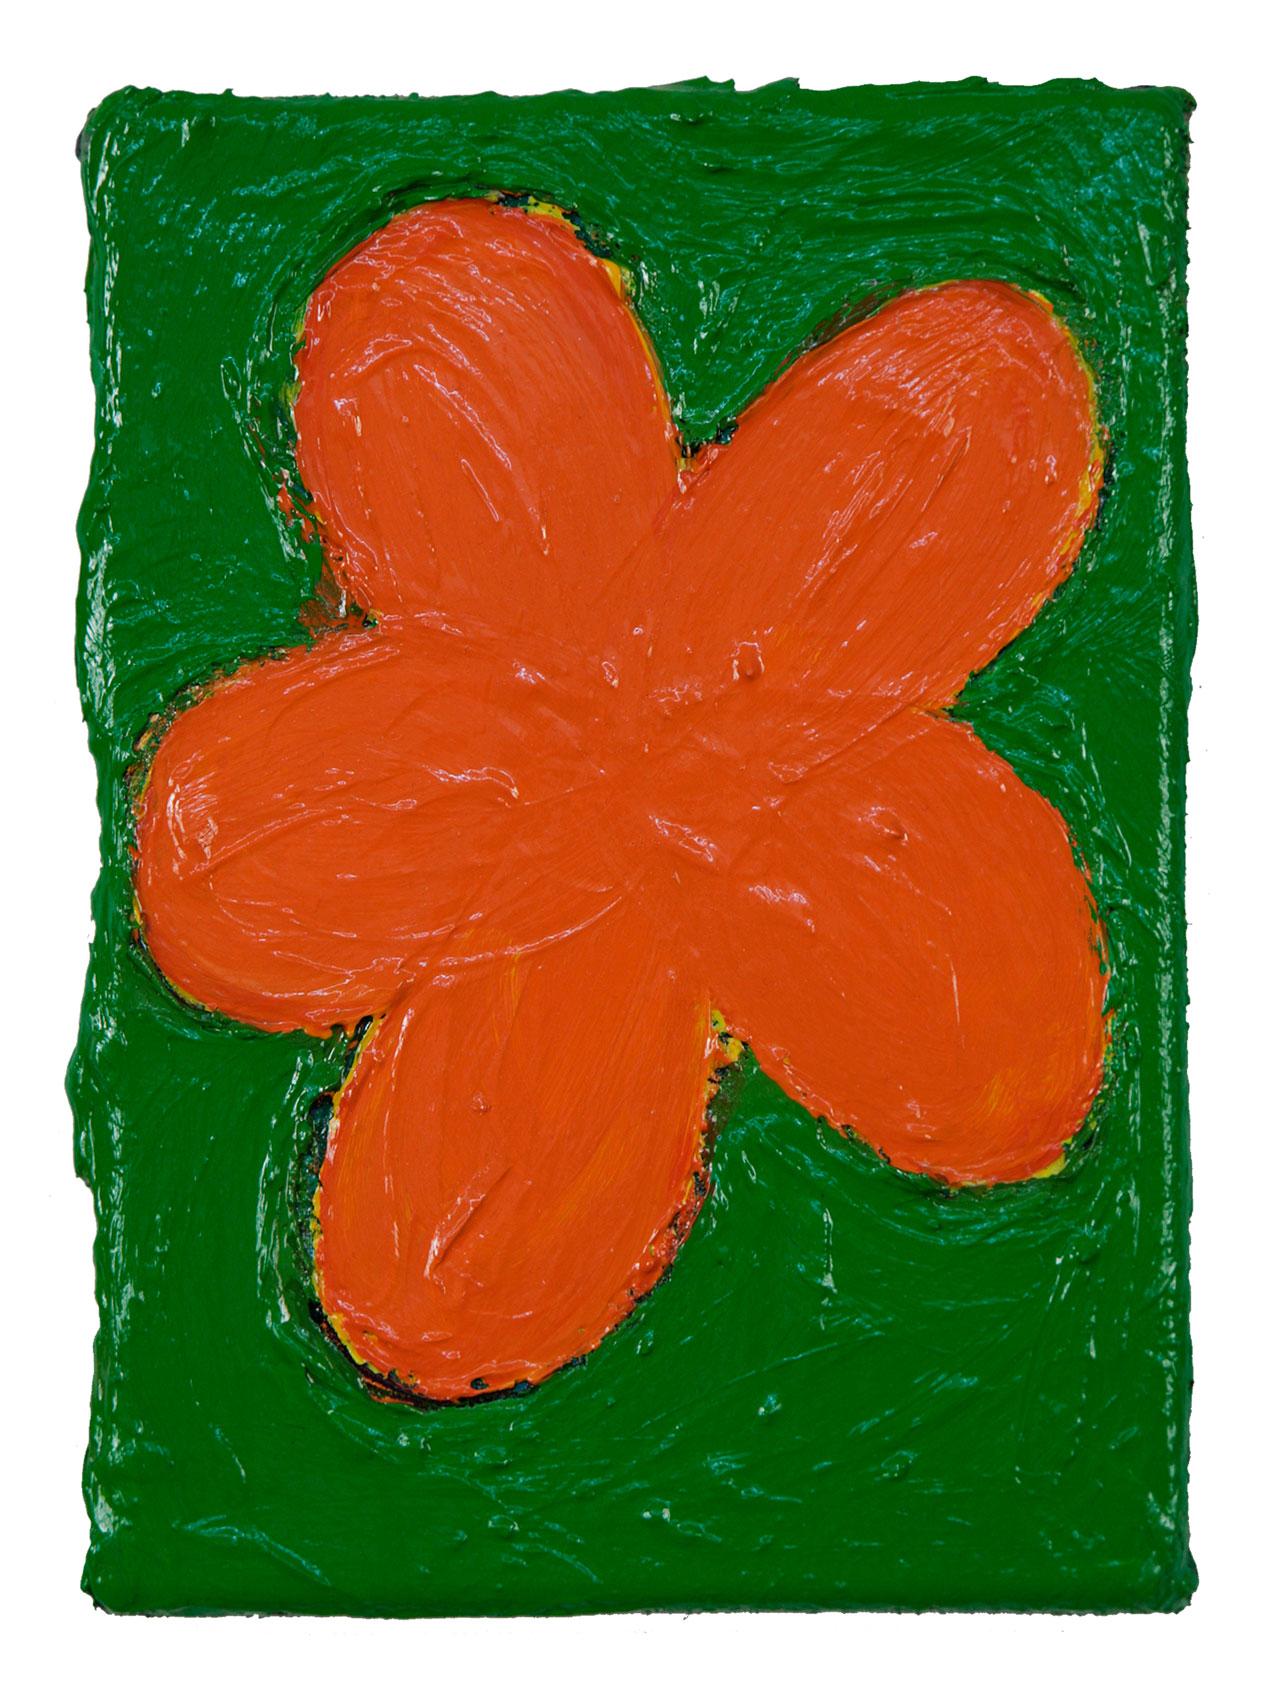 25 Flowers 20 | 2008 © Kerstin Jeckel | MEMORY-PROJEKT # extra